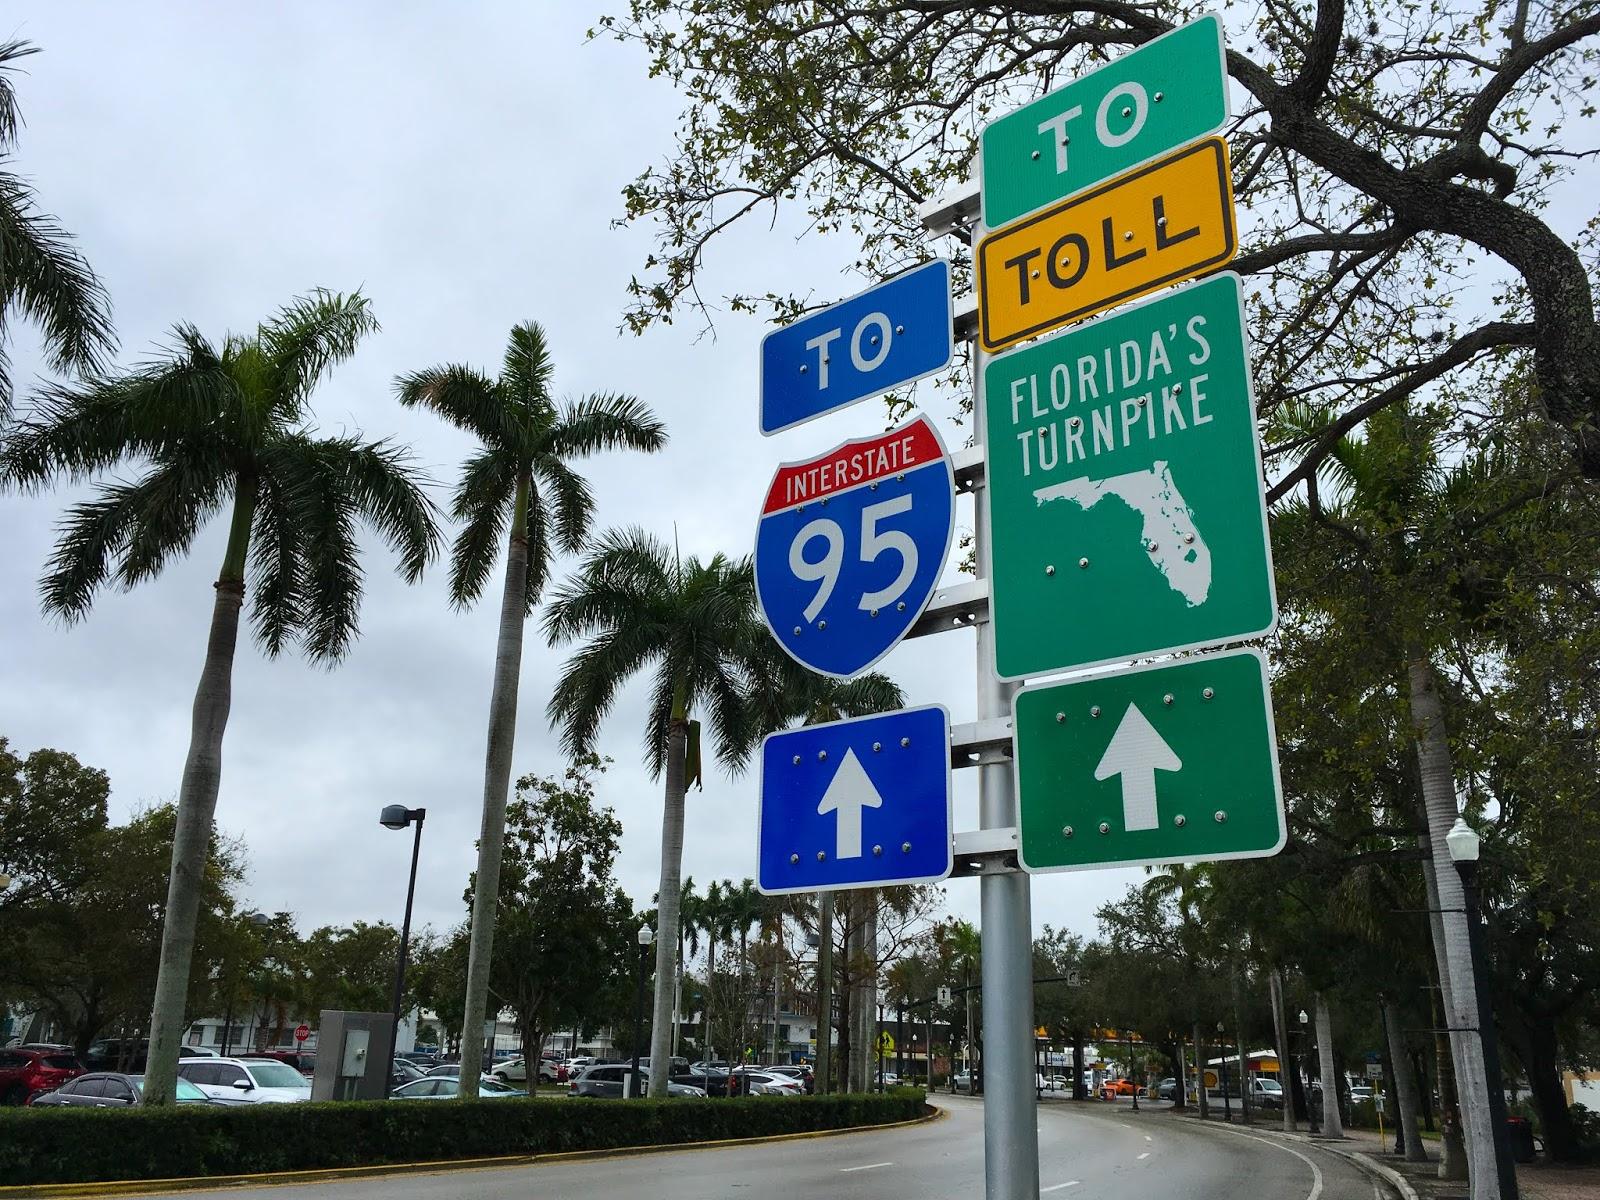 Toll roads in Florida